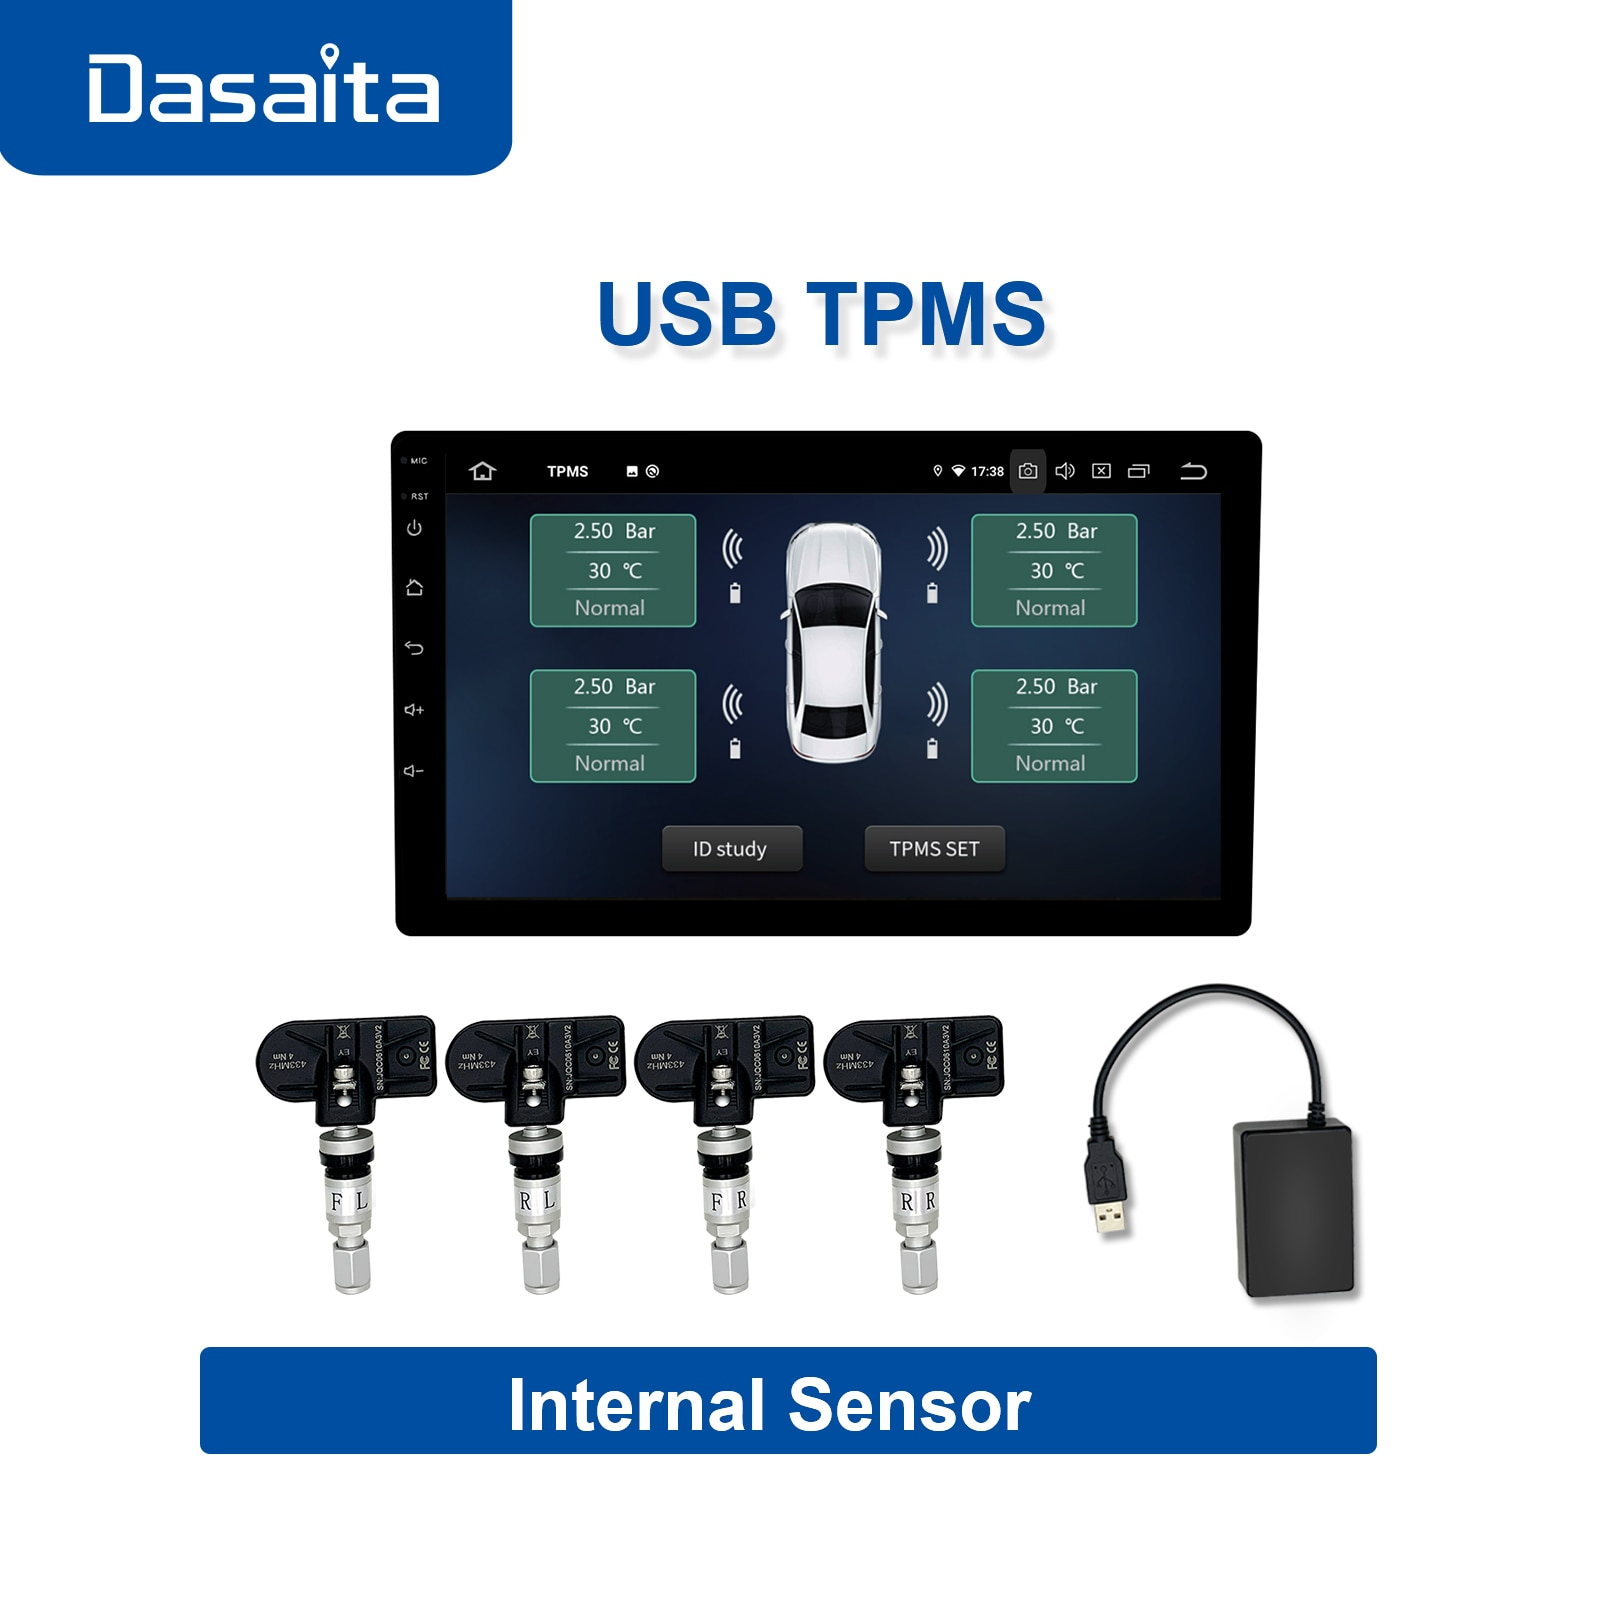 Dasaita tpms sensor external android System for Digital USB Auto Security Car Alarm Tire Pressure Se